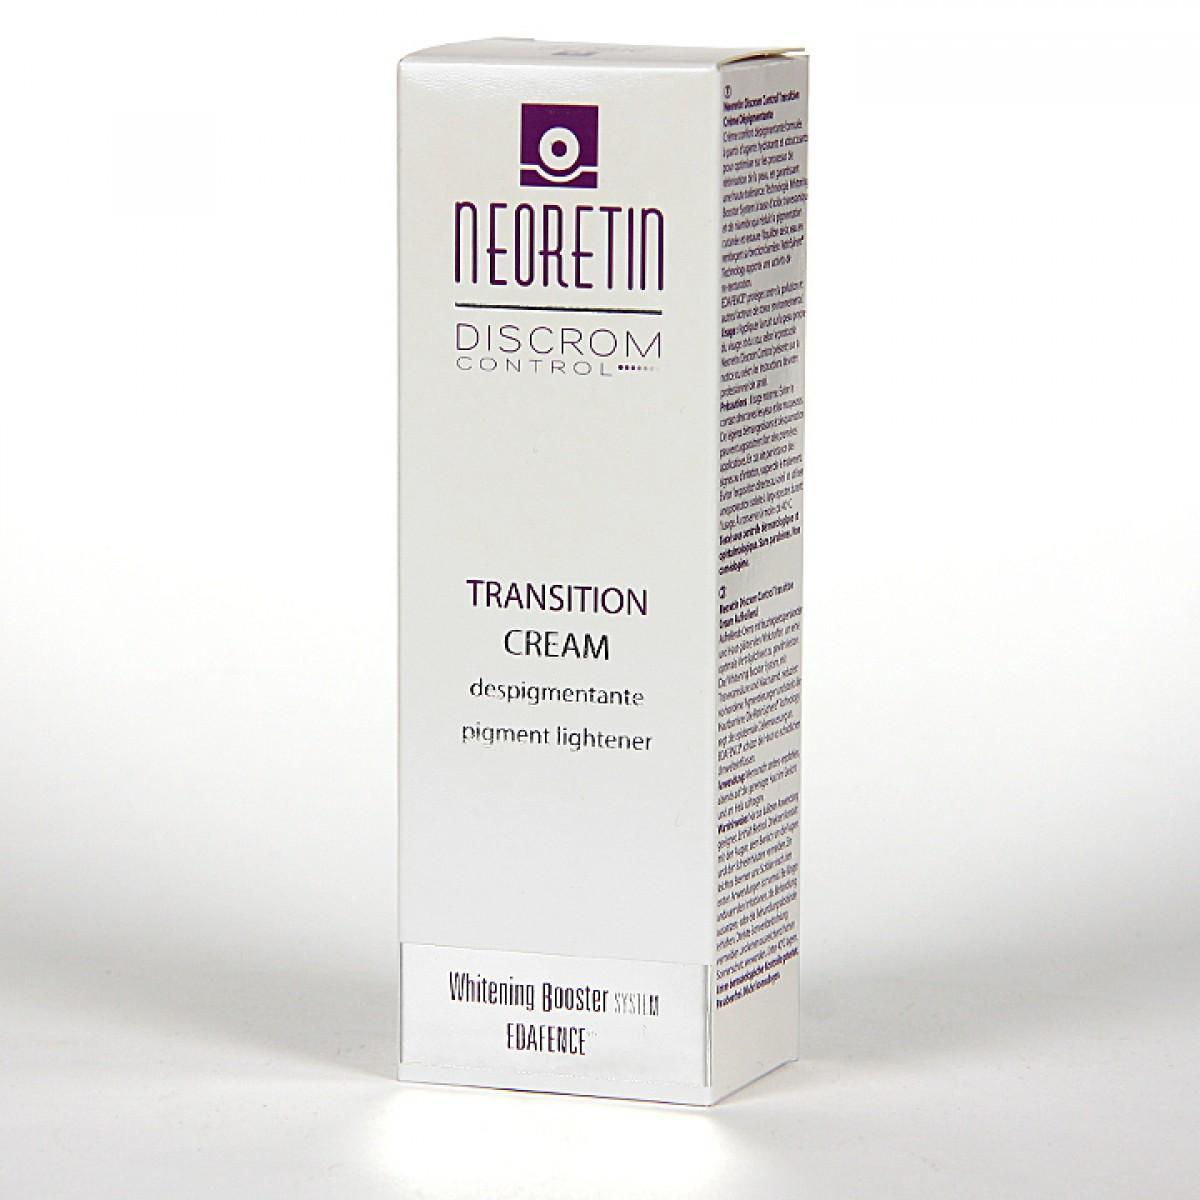 Neoretin Discrom Transition   Despigmentante Crema 50m